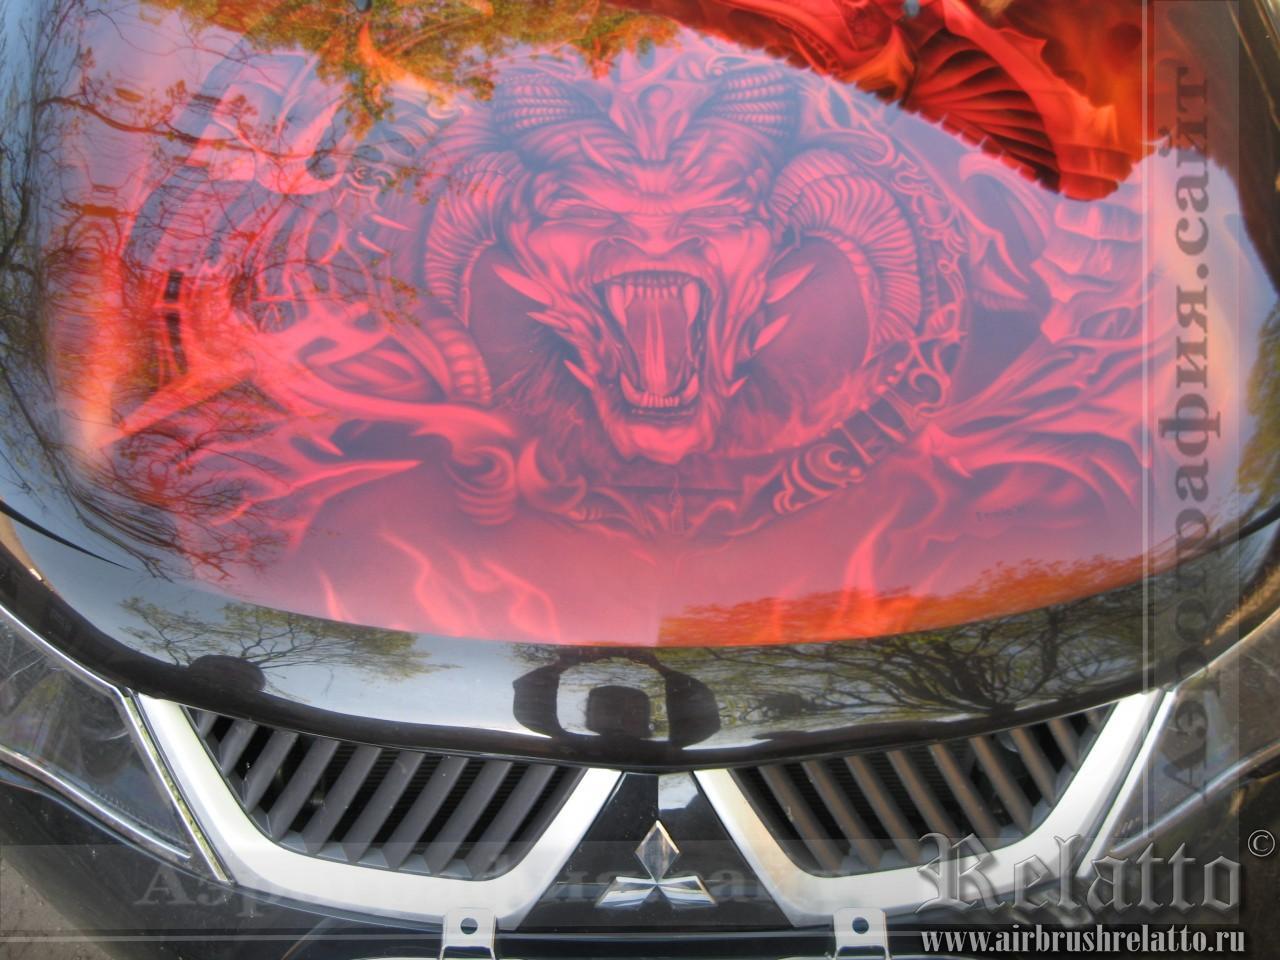 Рисунок на капоте автомобиля